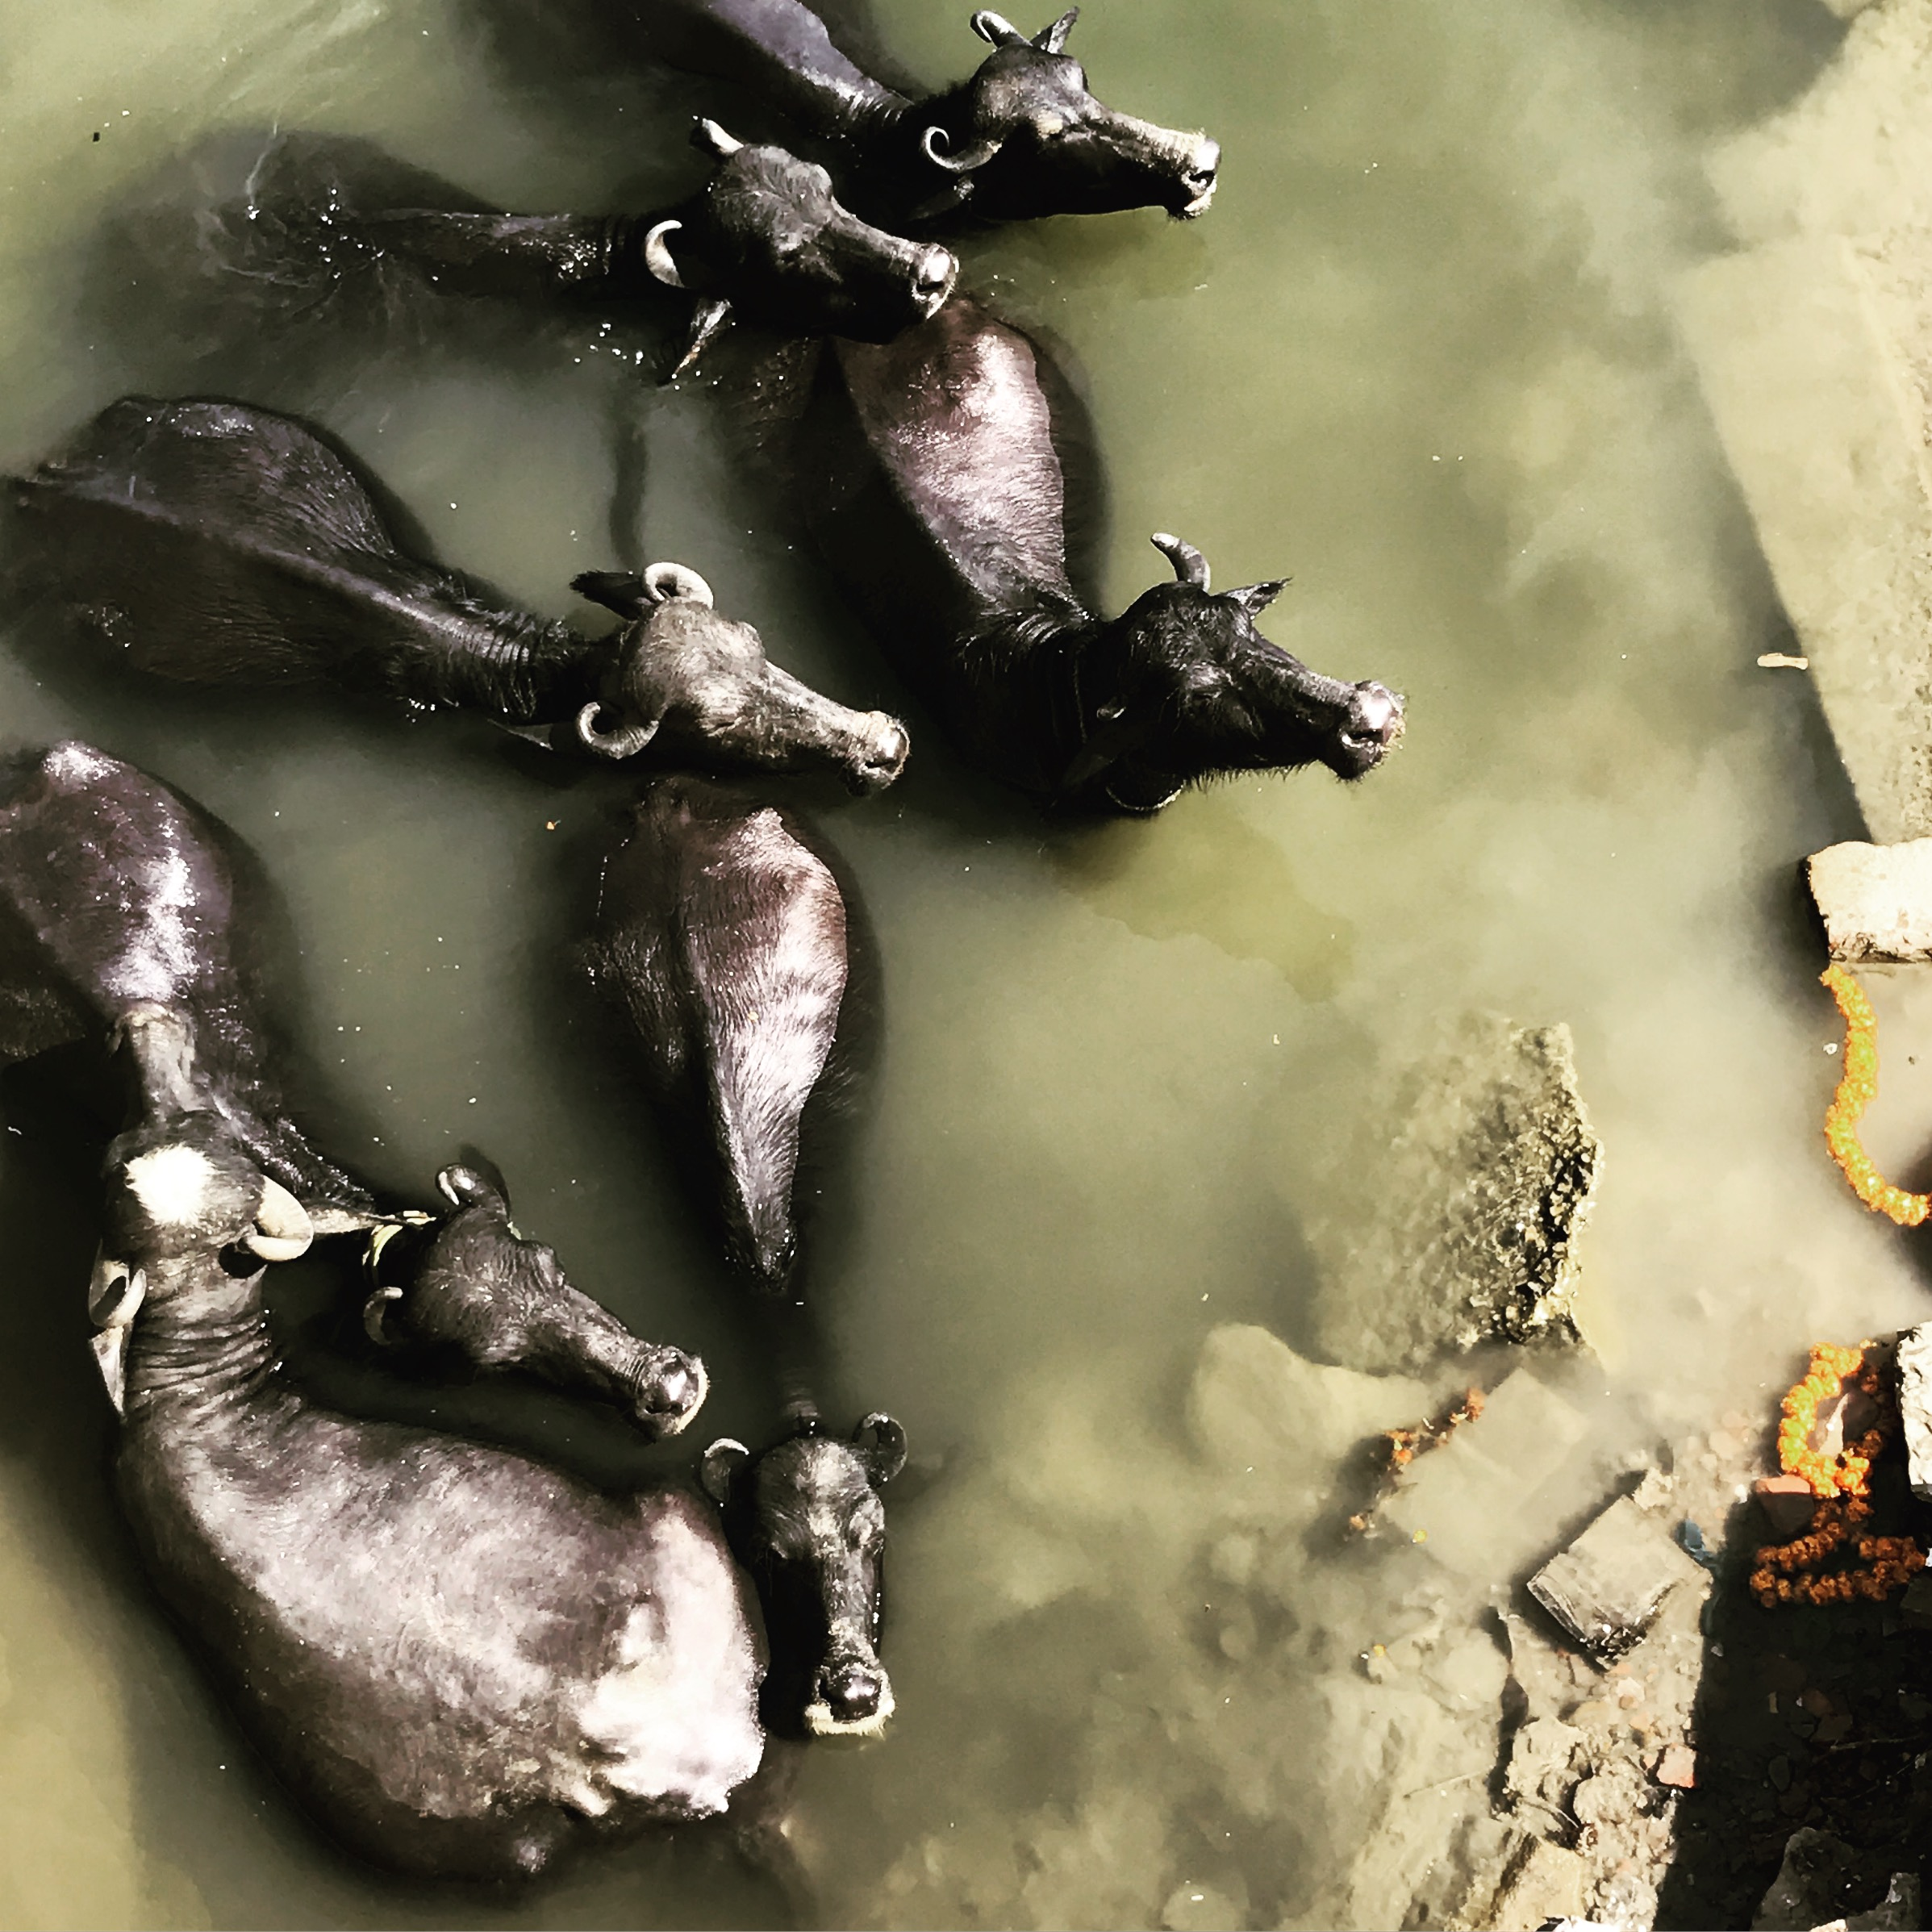 water buffalo in Varanasi